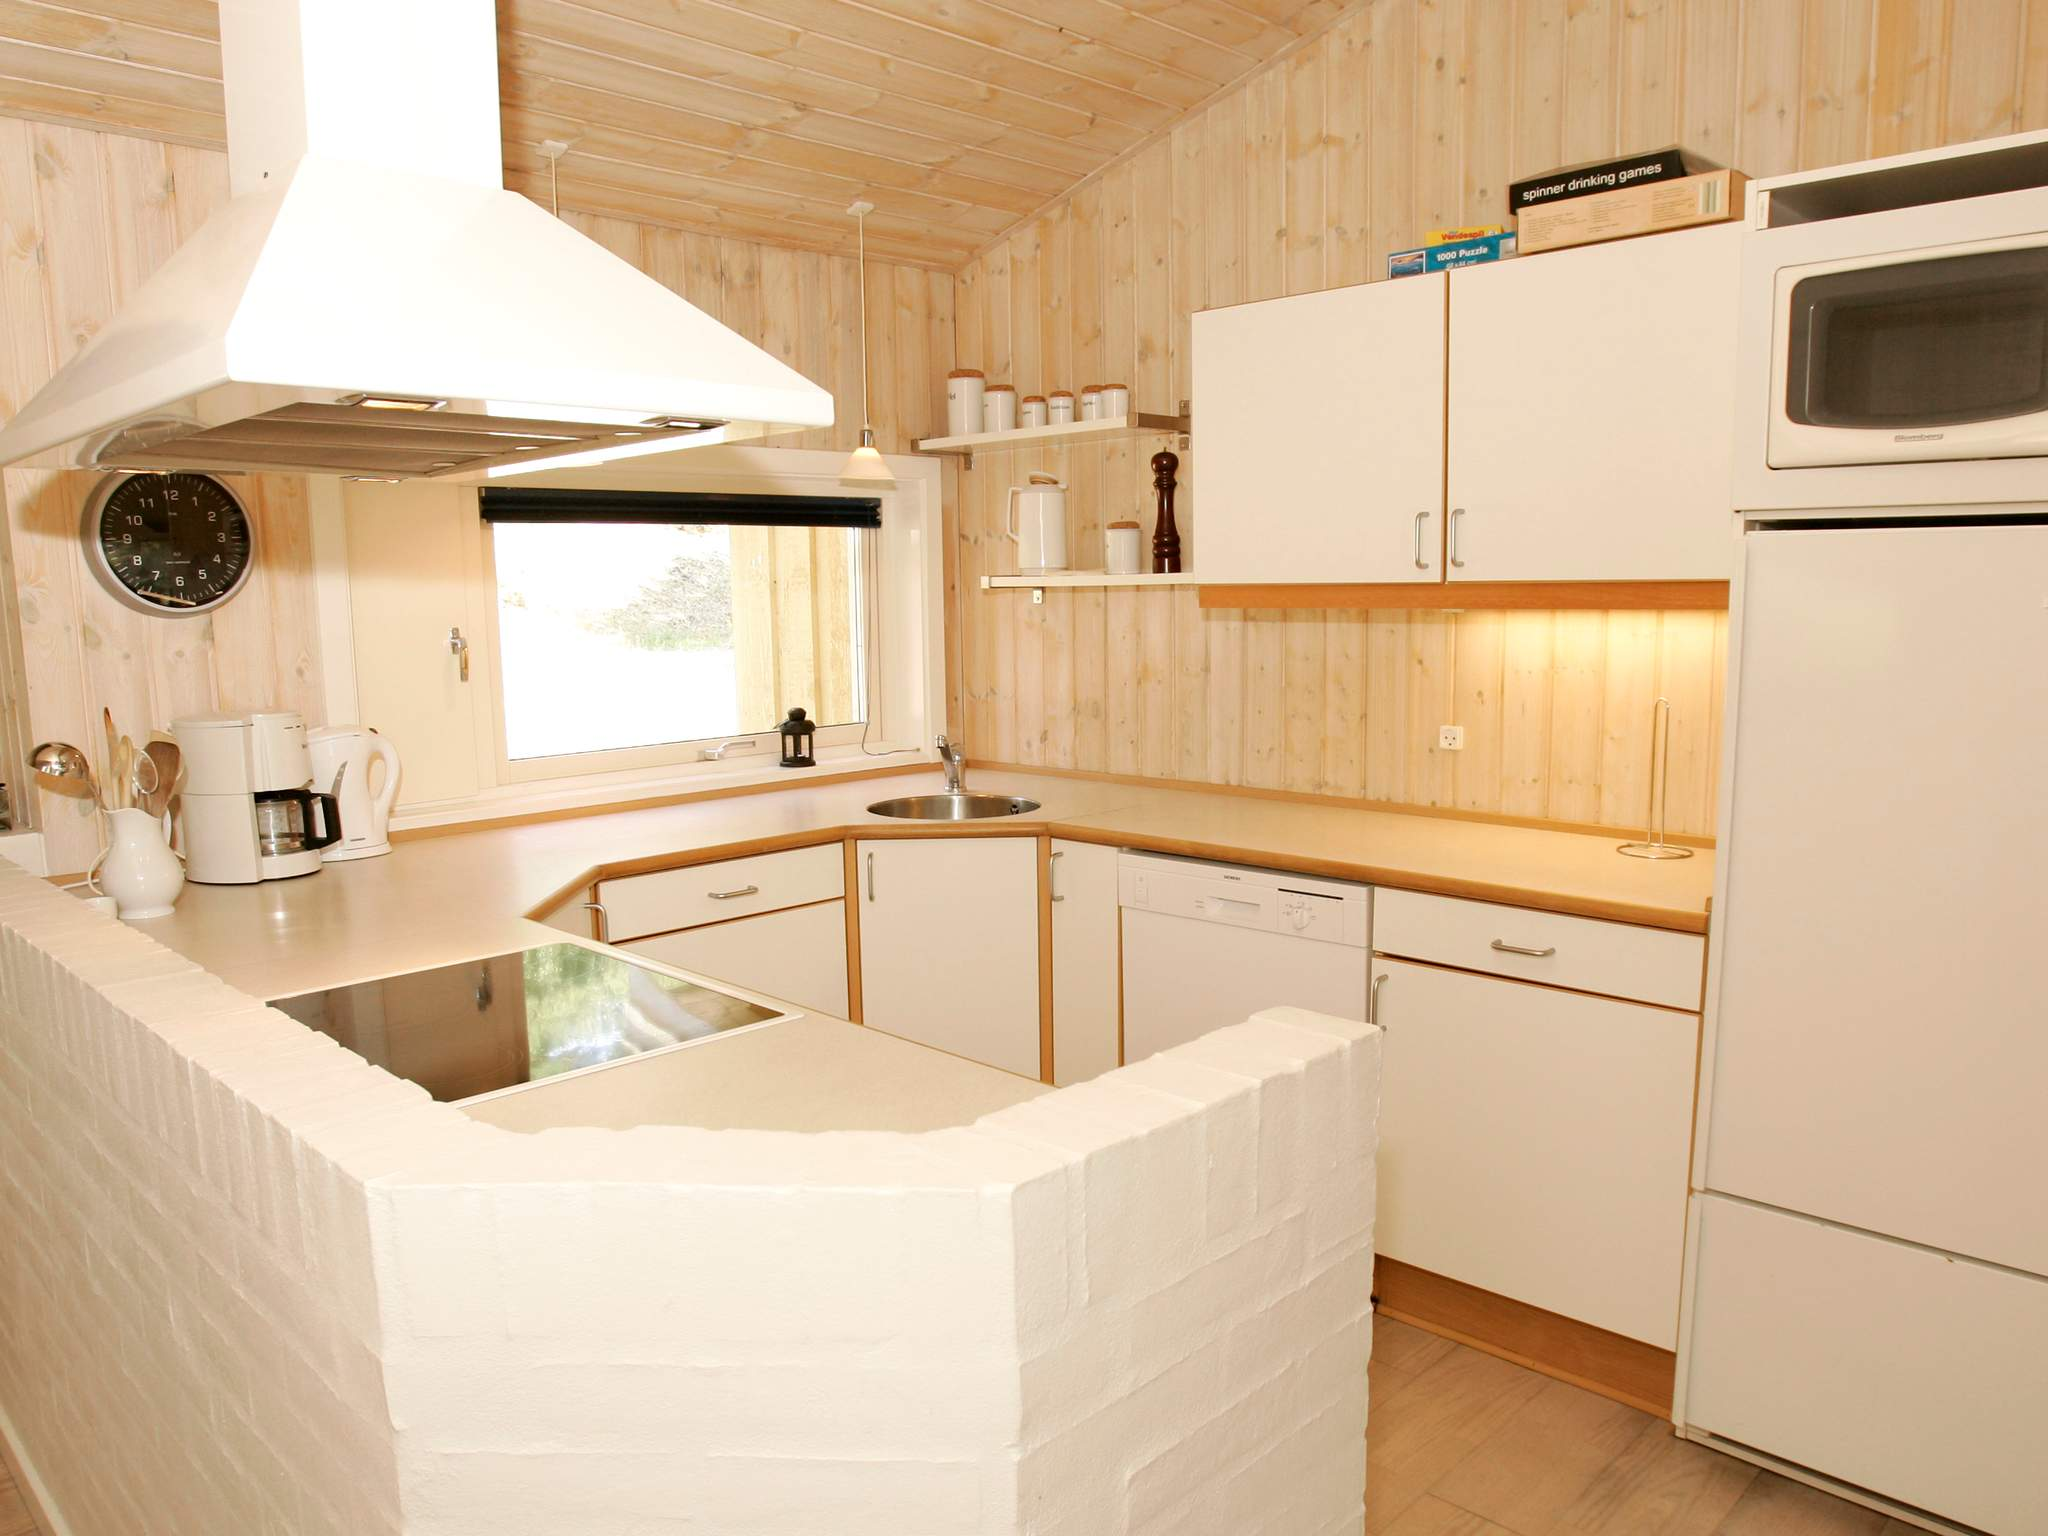 Ferienhaus Sommerodde (82541), Nexø, , Bornholm, Dänemark, Bild 5